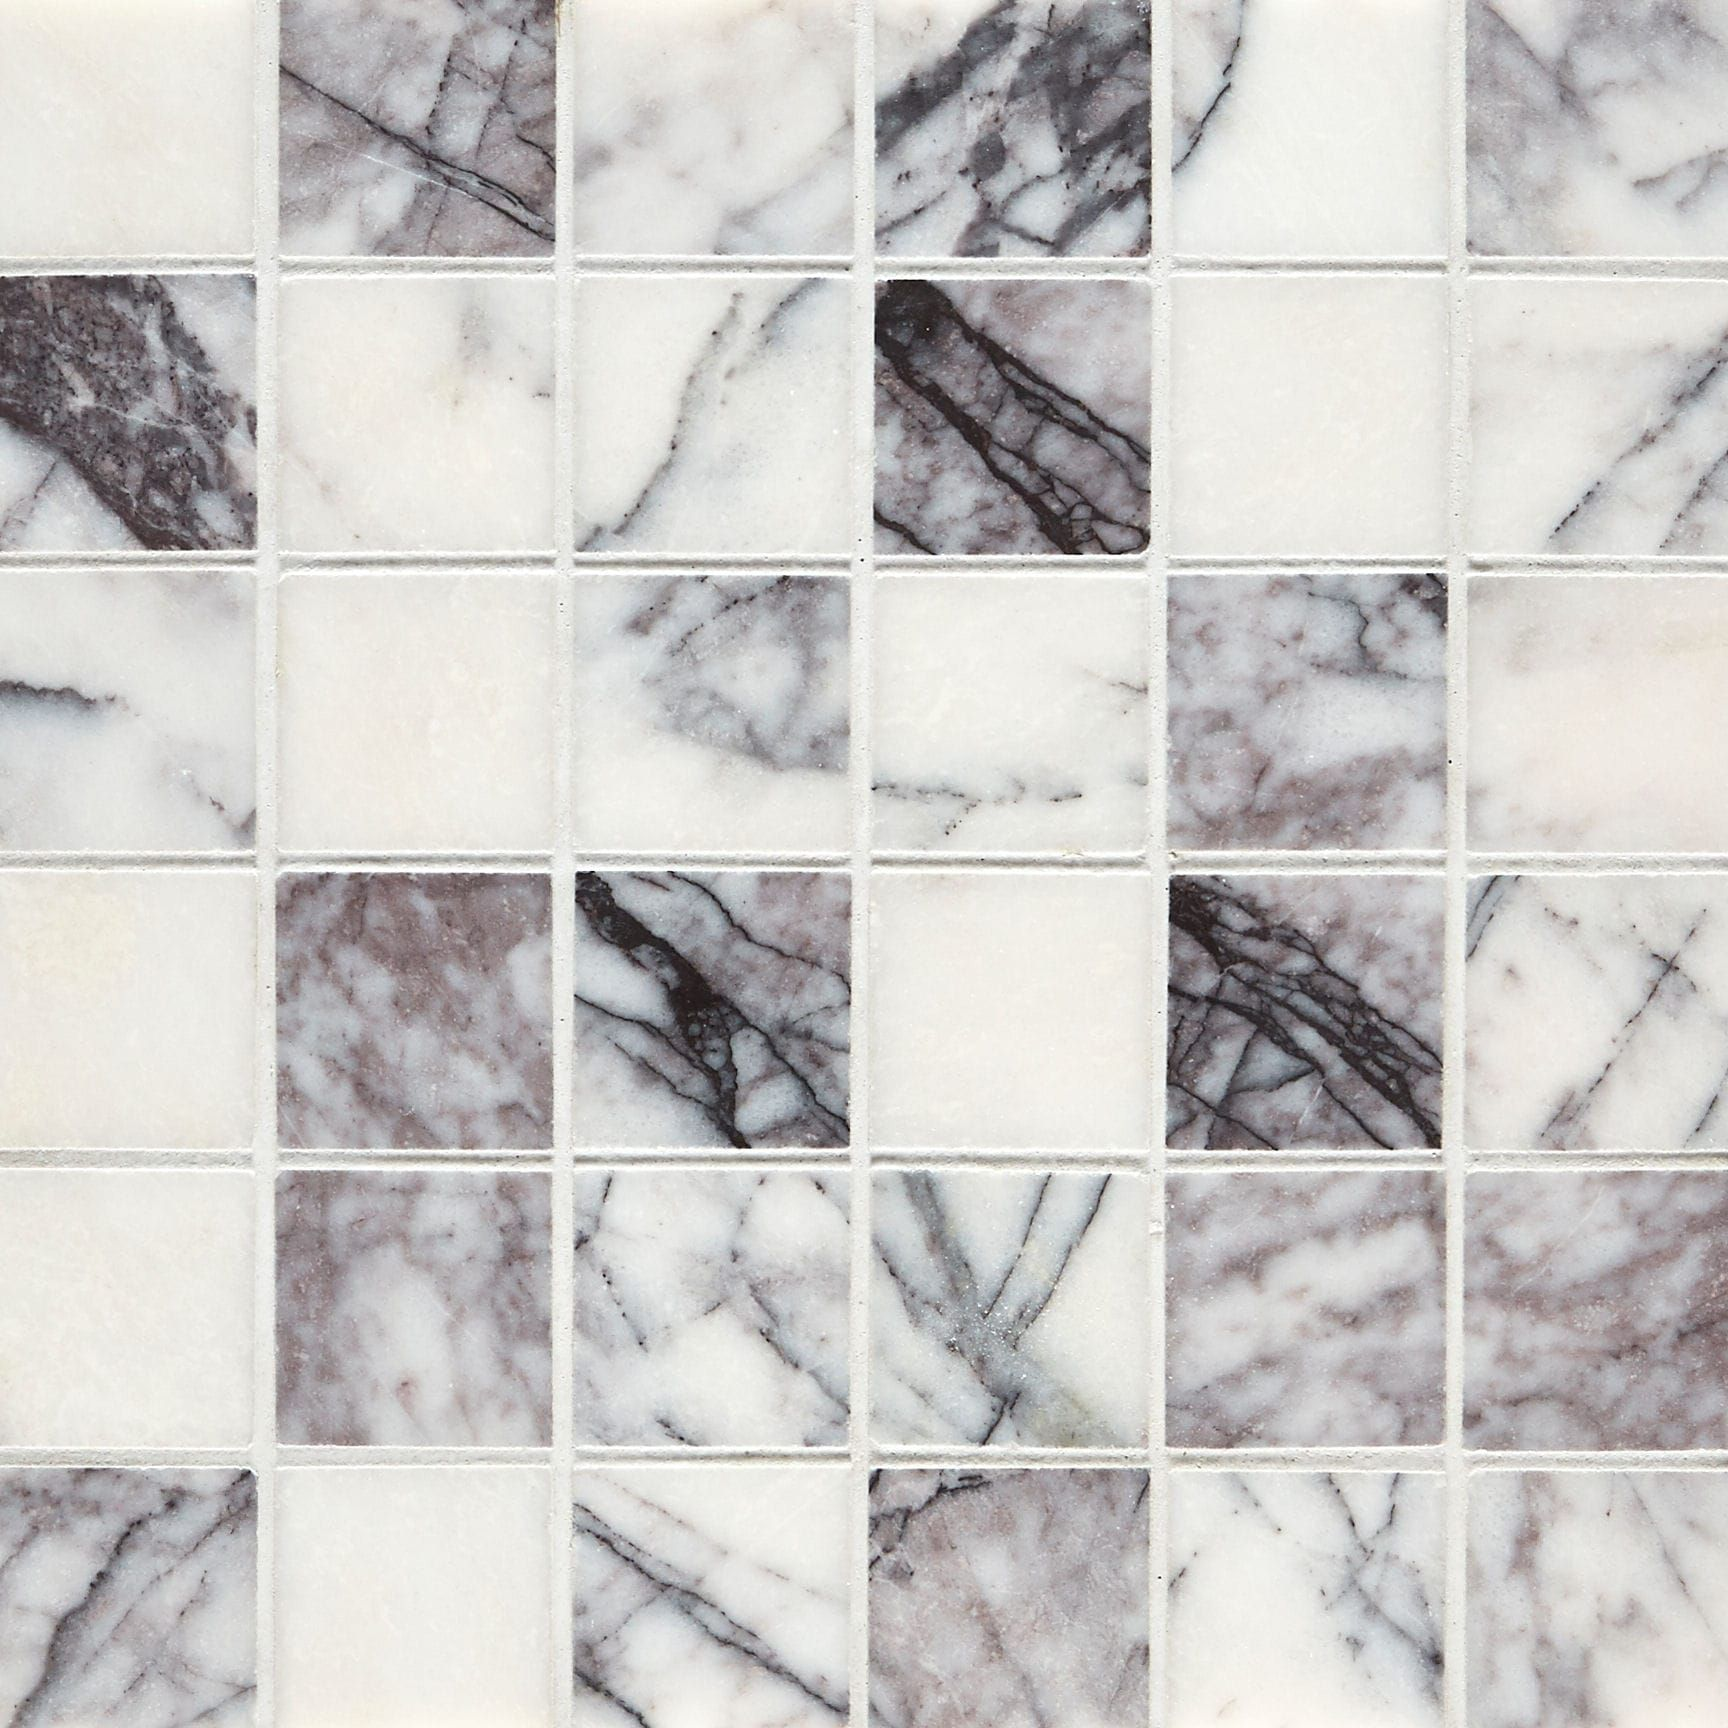 Browse Calacatta Viola Polished Marble Mosaic Online At Mandarin Stone Shop Online Or Visit Your Nearest Show Marble Mosaic Marble Mosaic Tiles Mandarin Stone